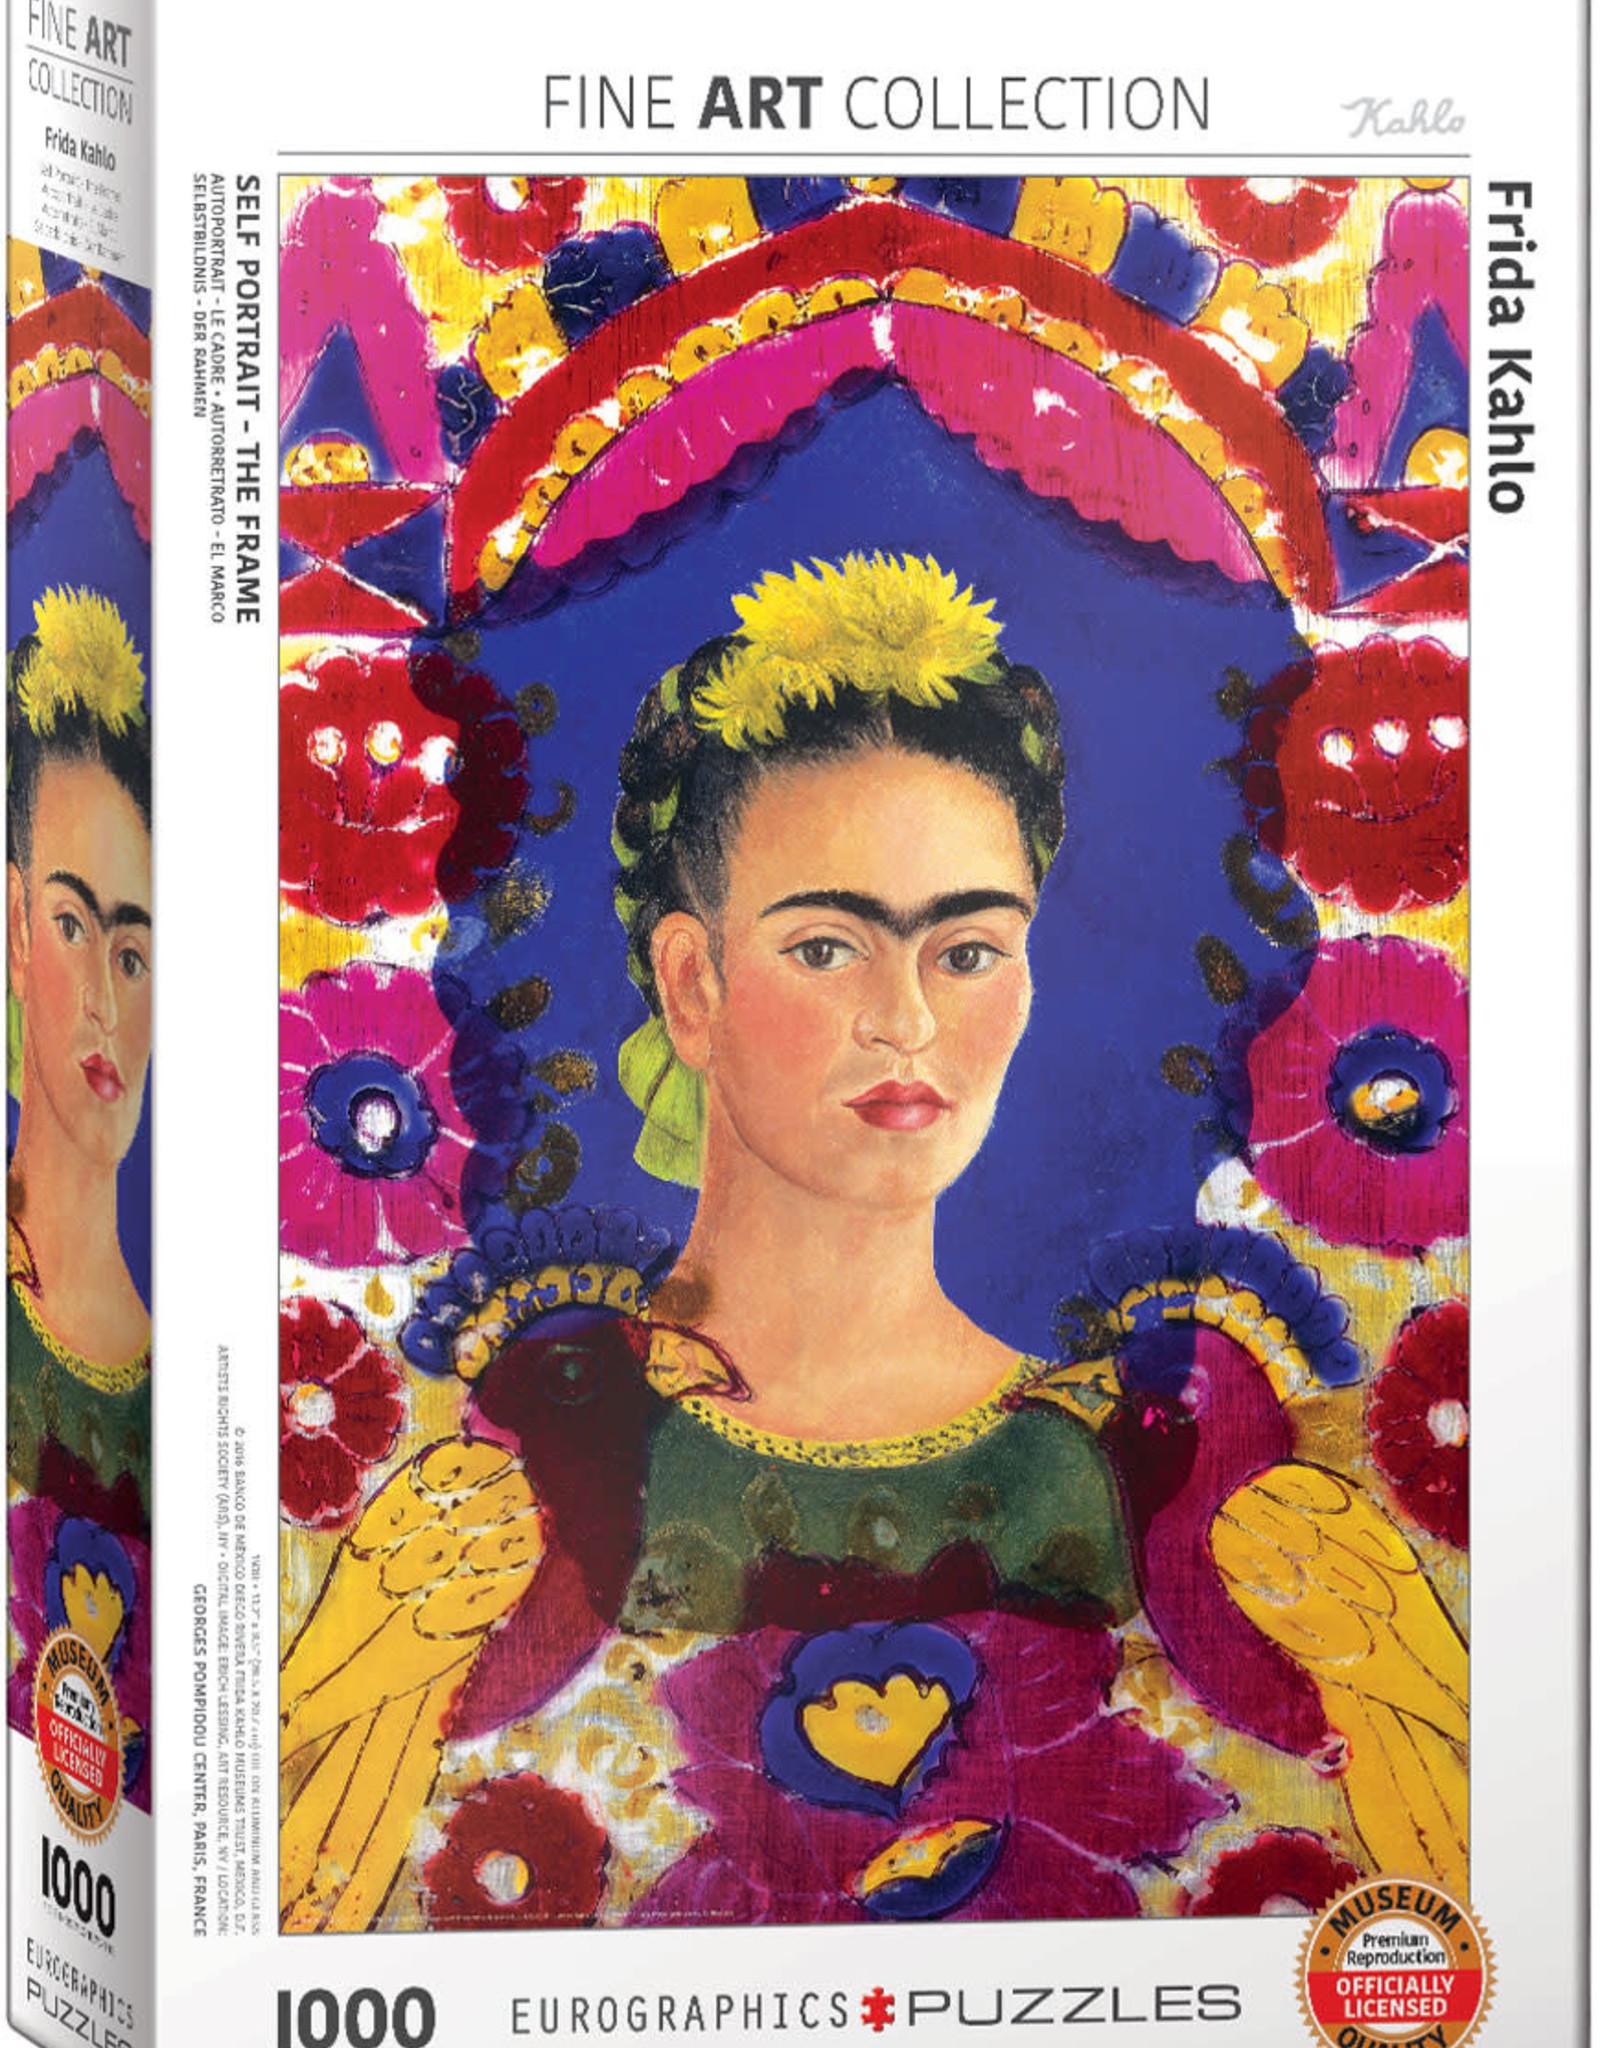 Eurographics Self Portrait Frame by Frida K 1000pc